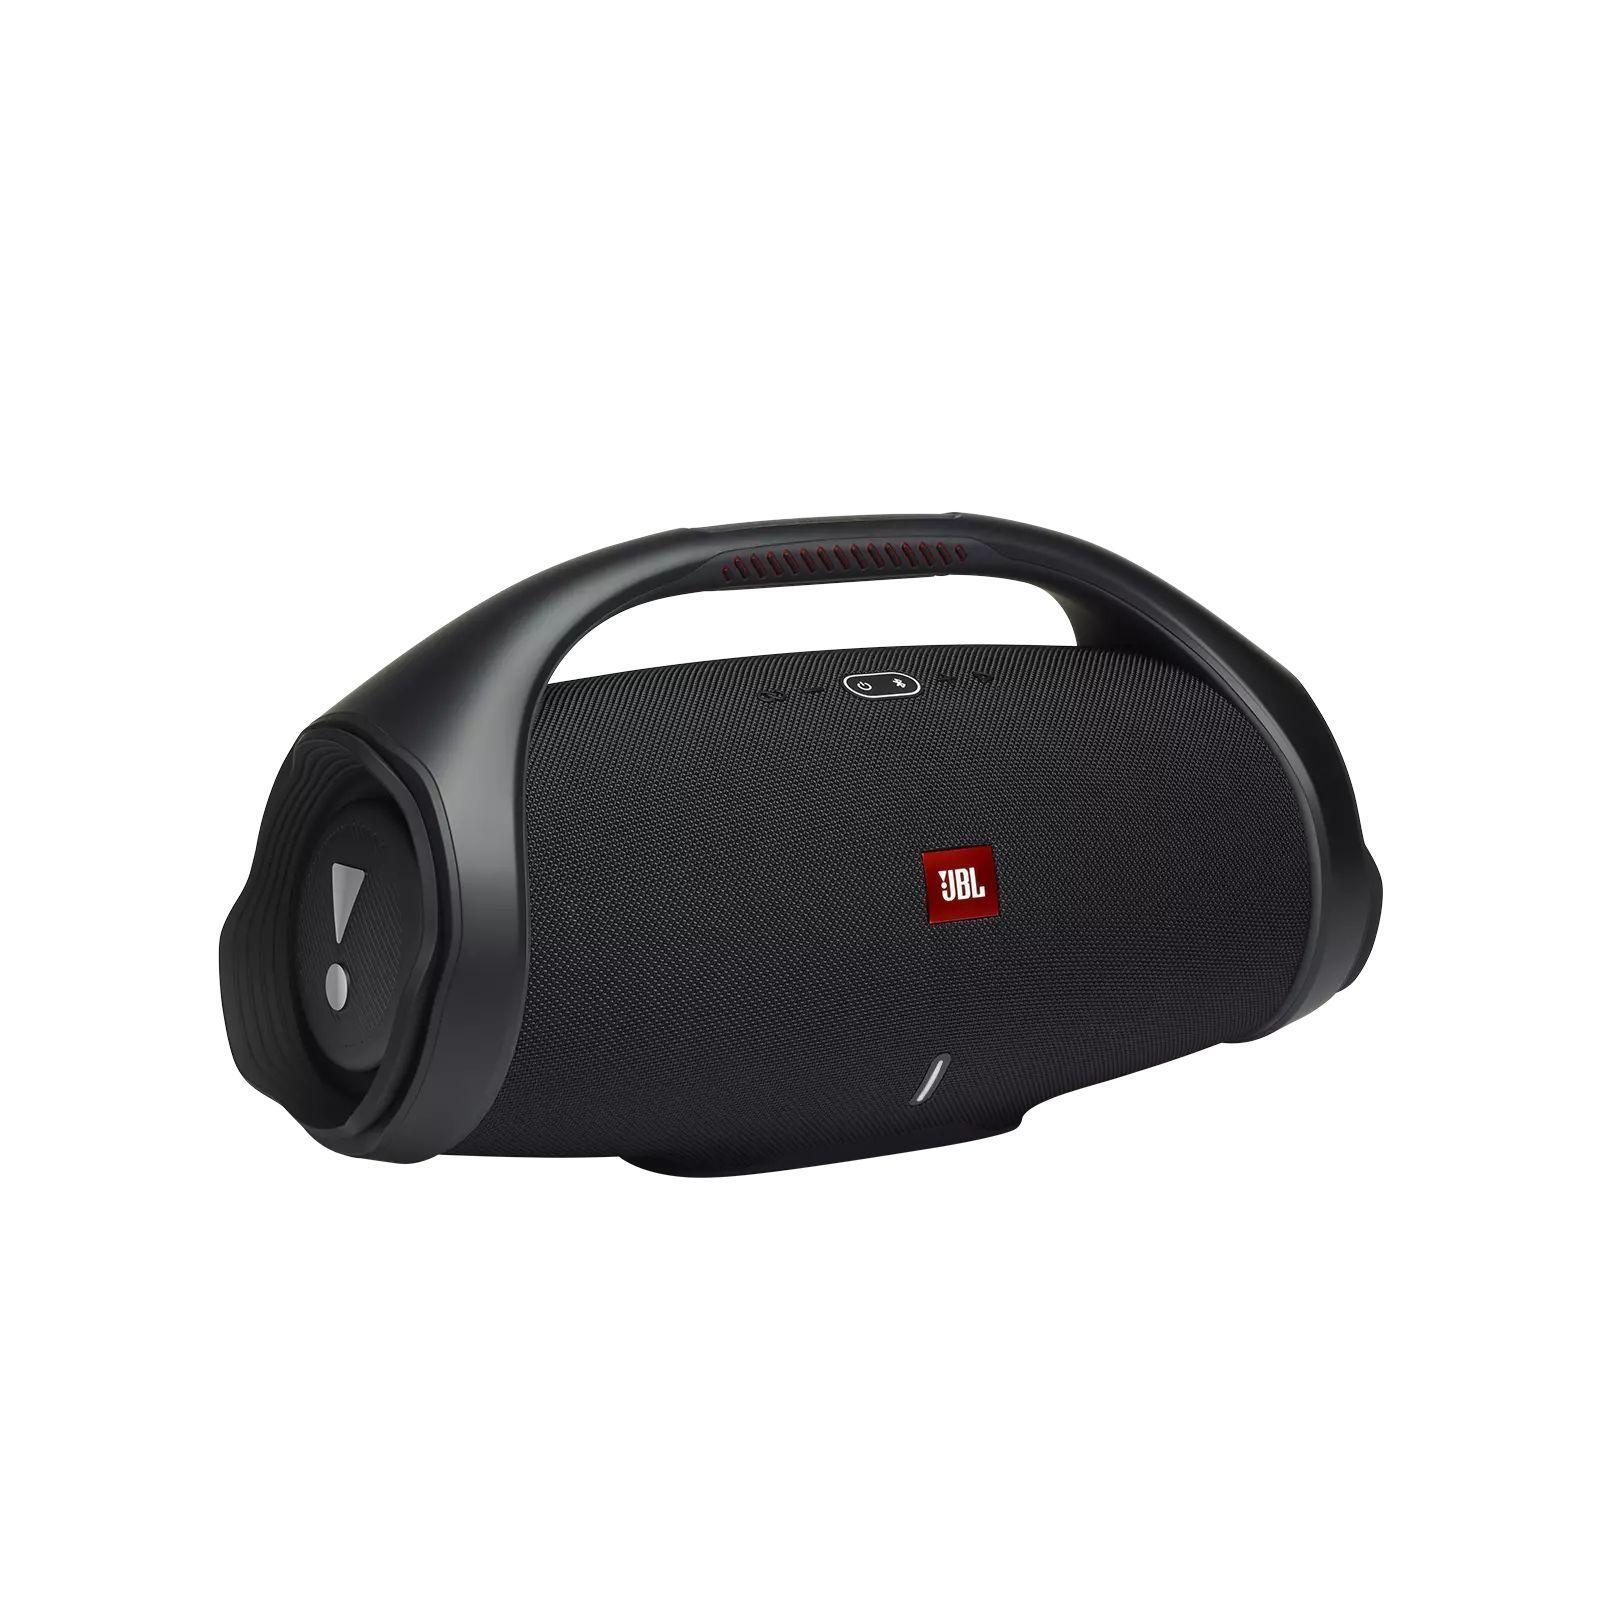 Caixa De Som Portátil JBL Boombox 2 Com Bluetooth